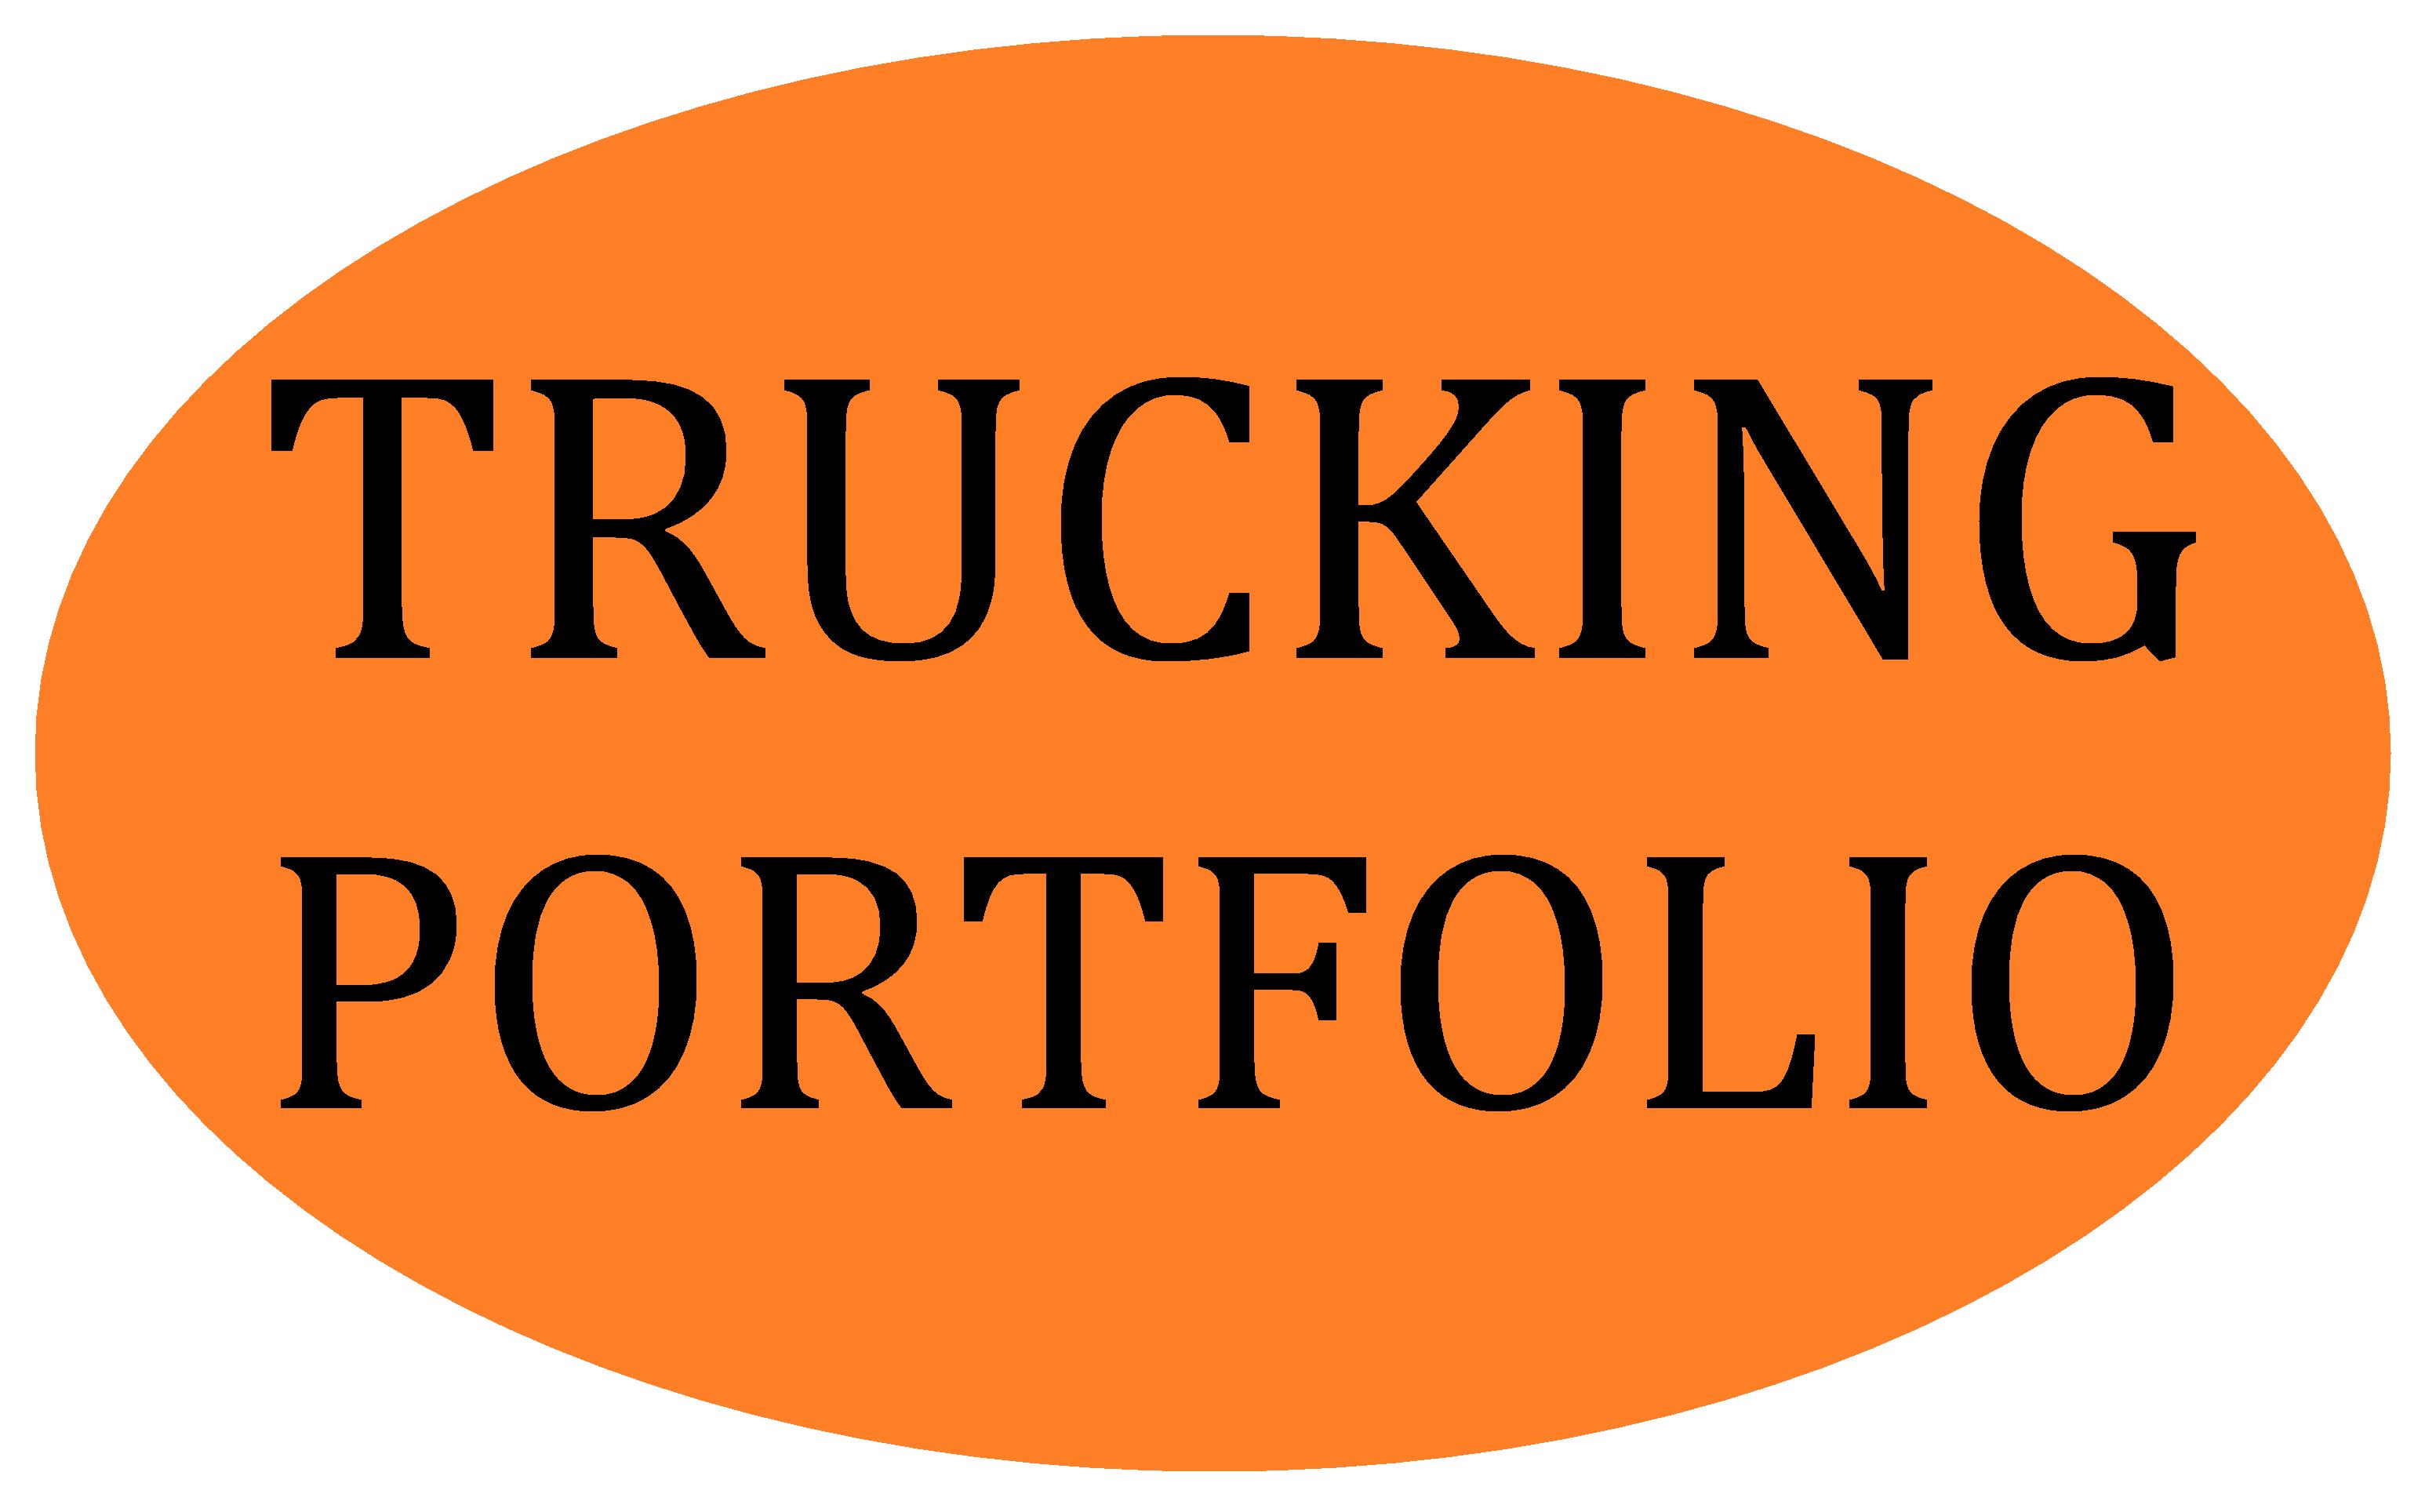 Portfolio Trucking